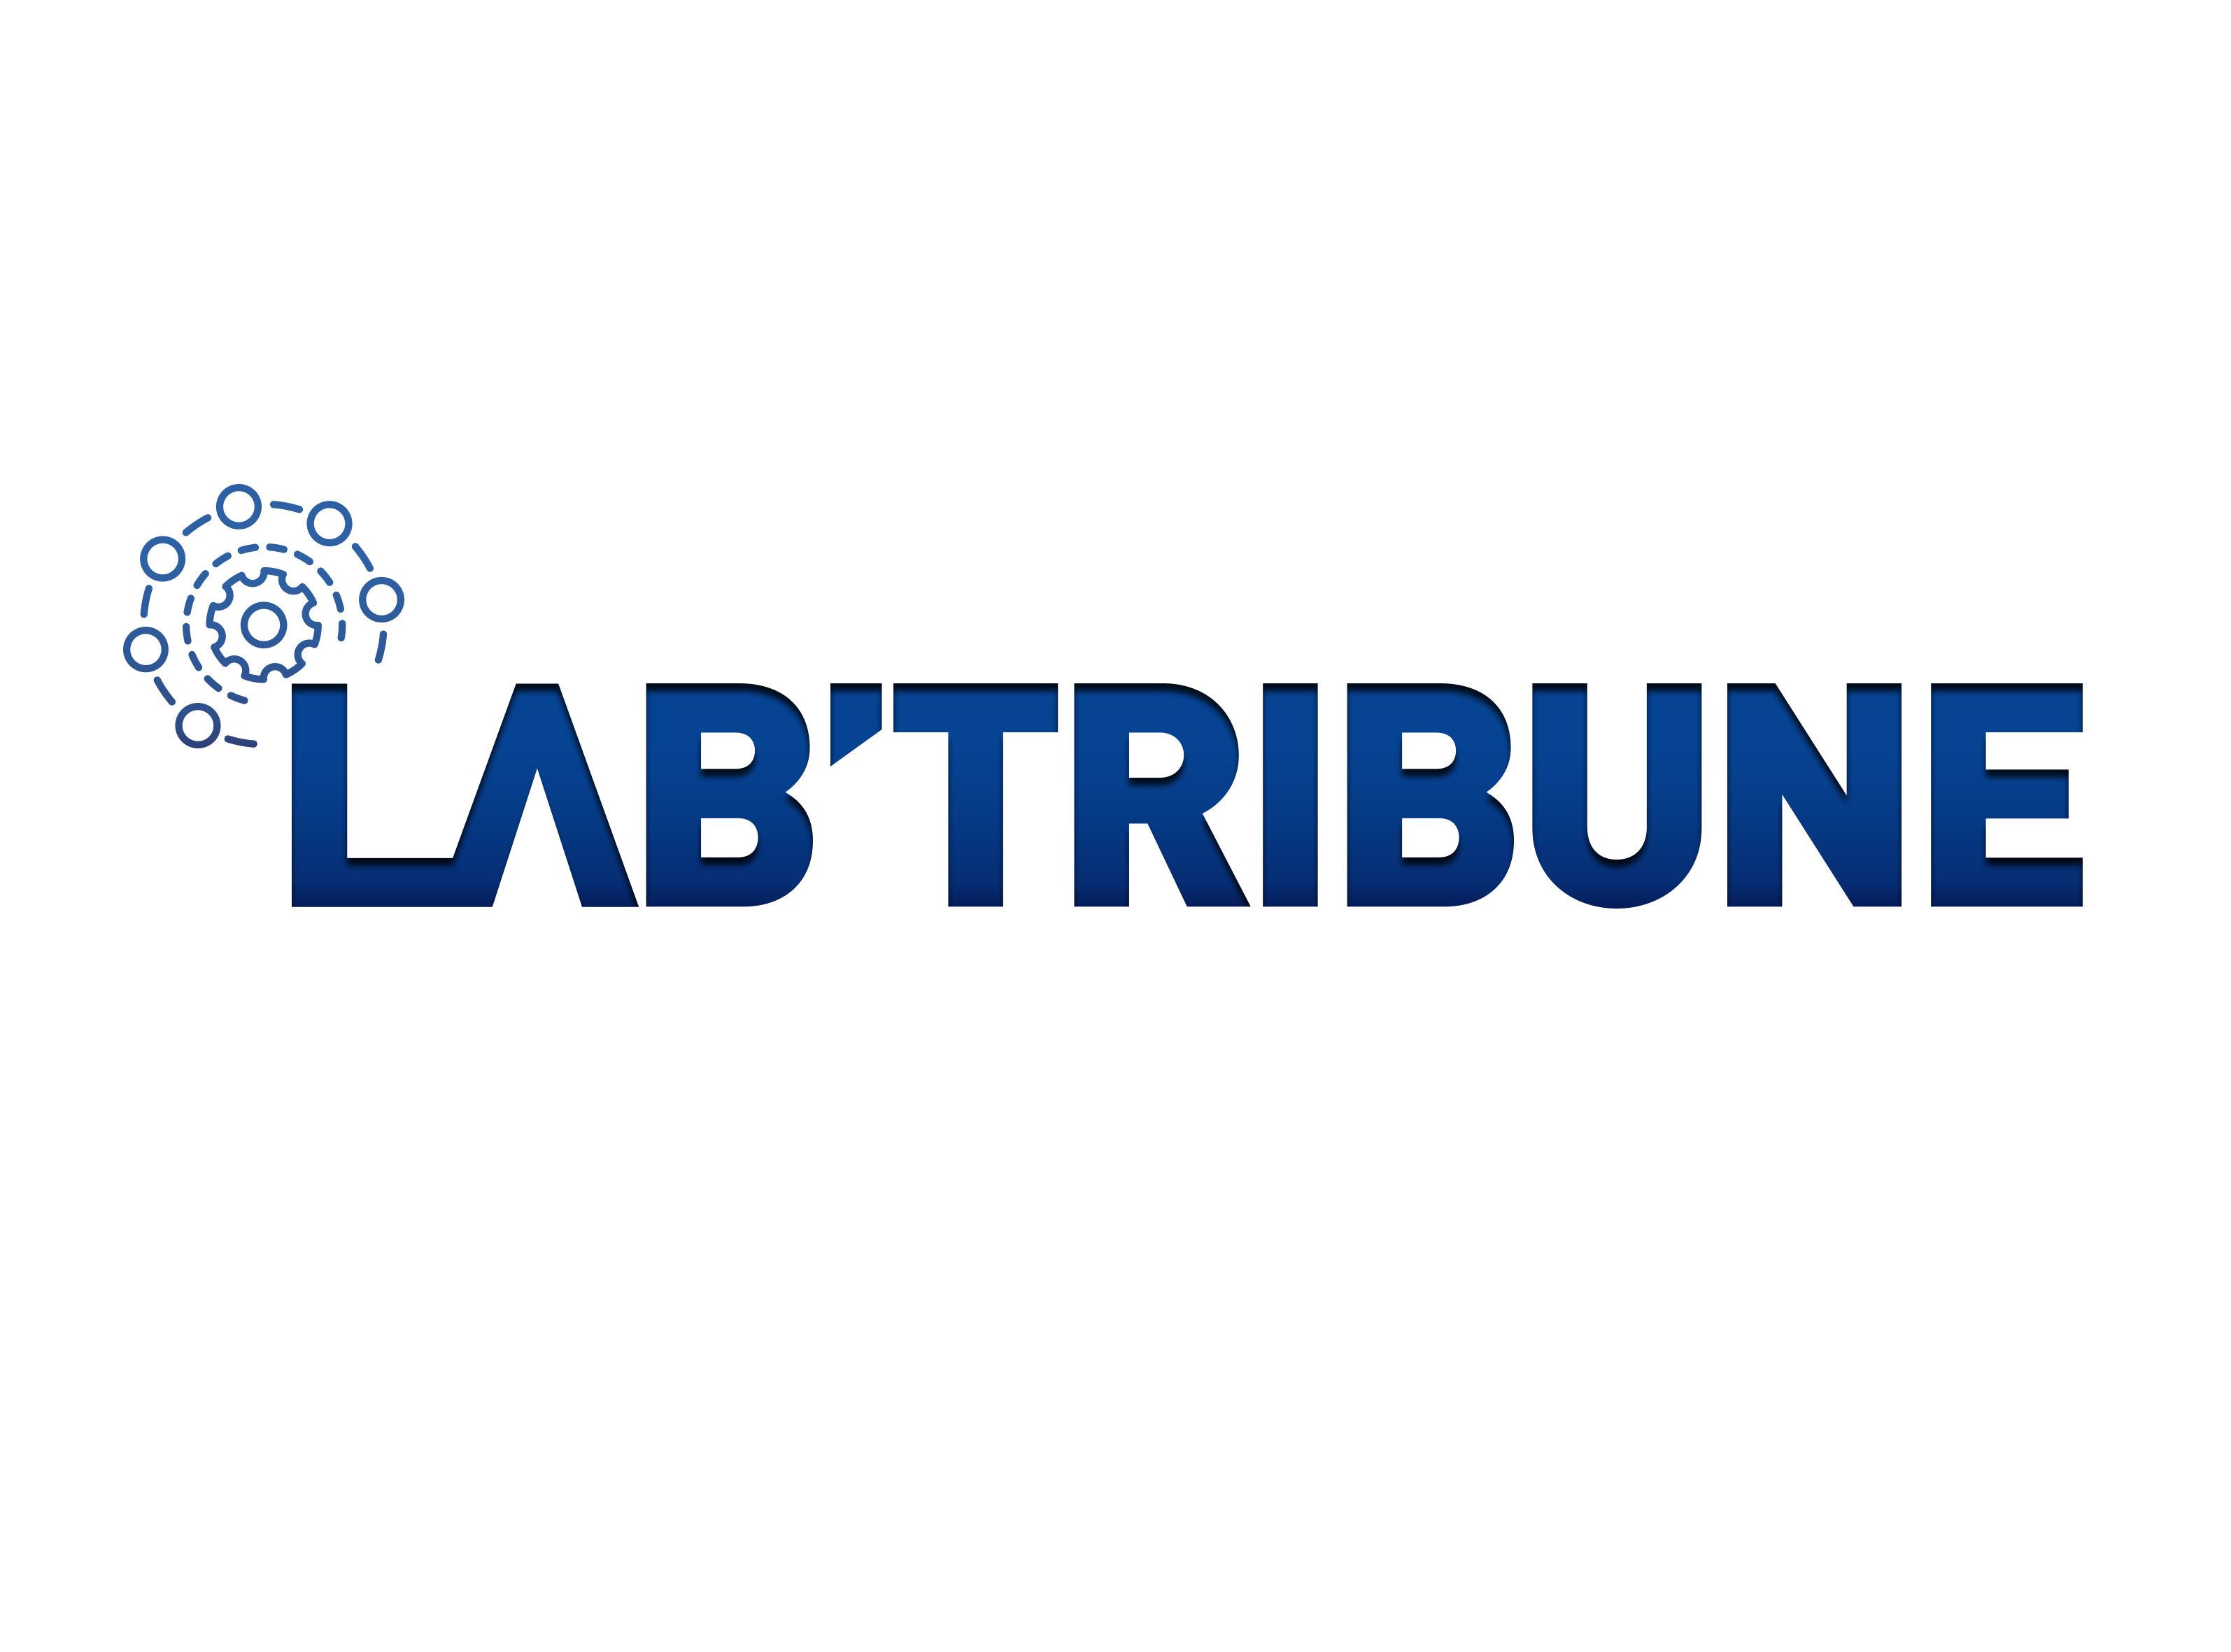 Labtribunesimple15796867251579686725